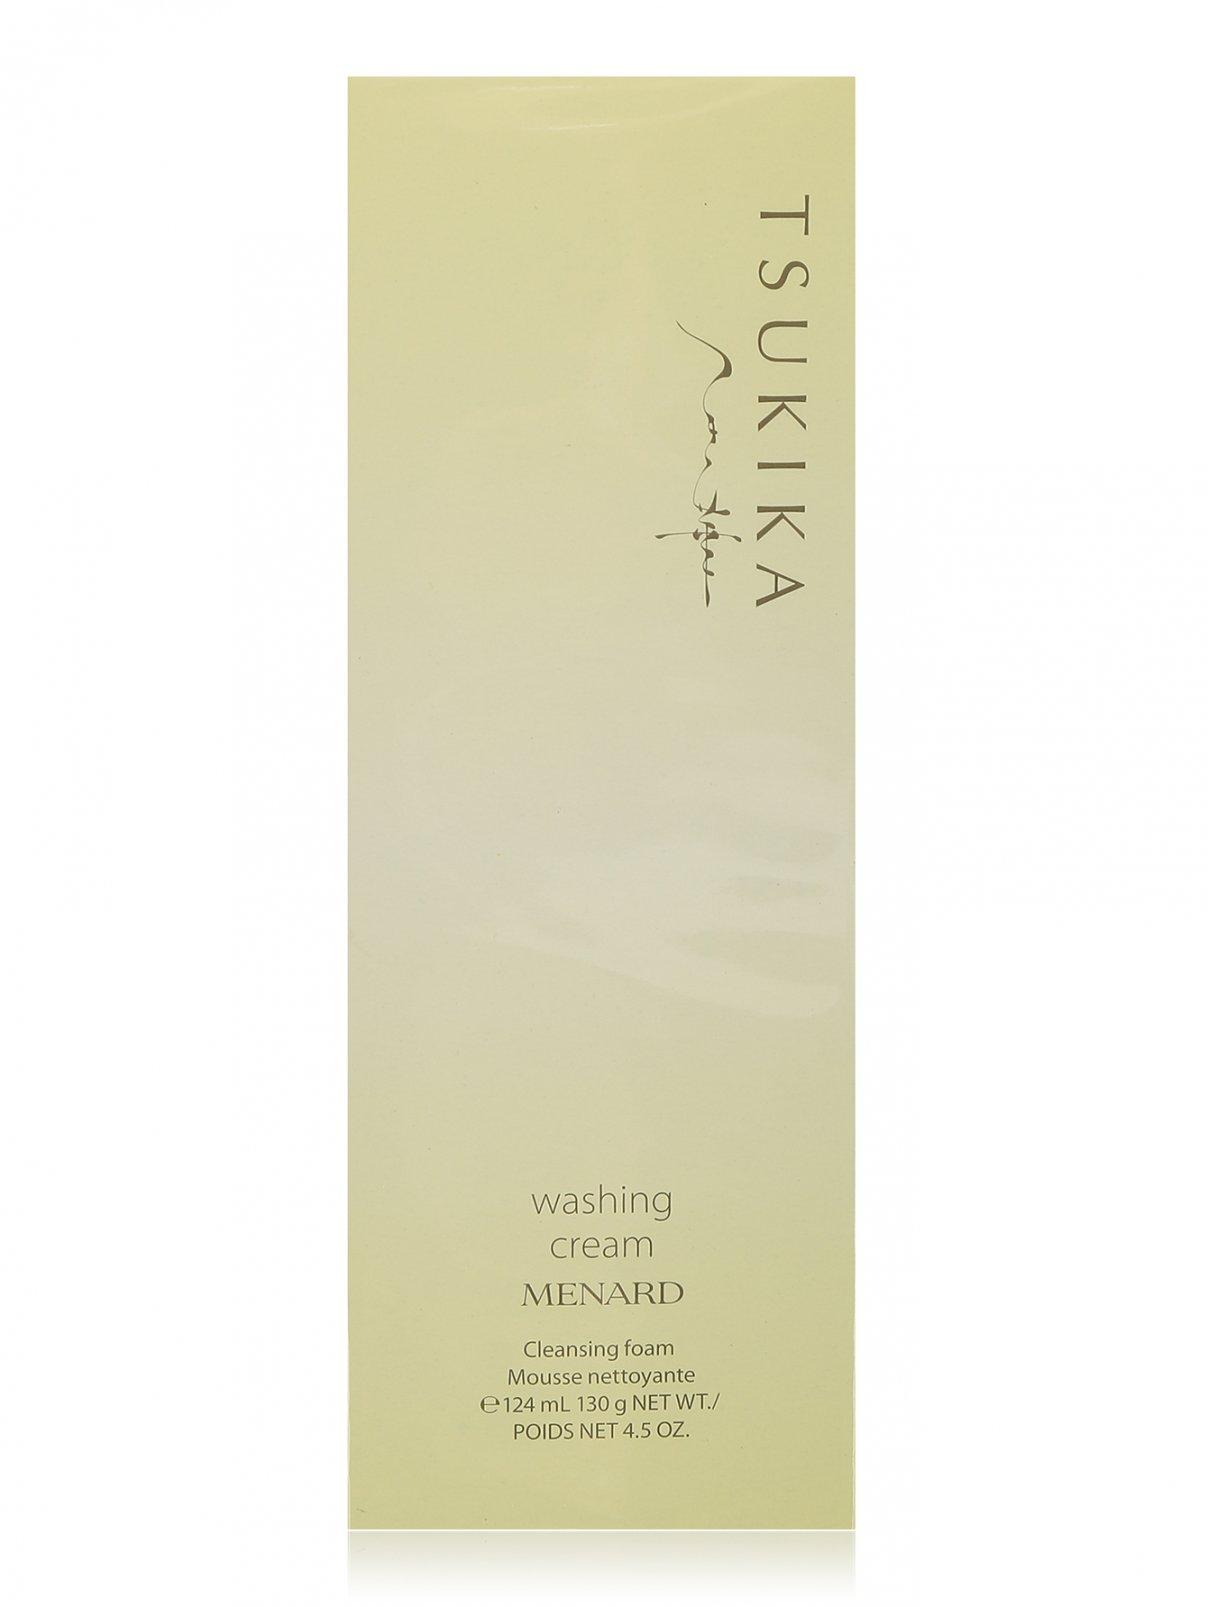 Tsukika Крем для умывания 130 г Skin Care Menard  –  Общий вид